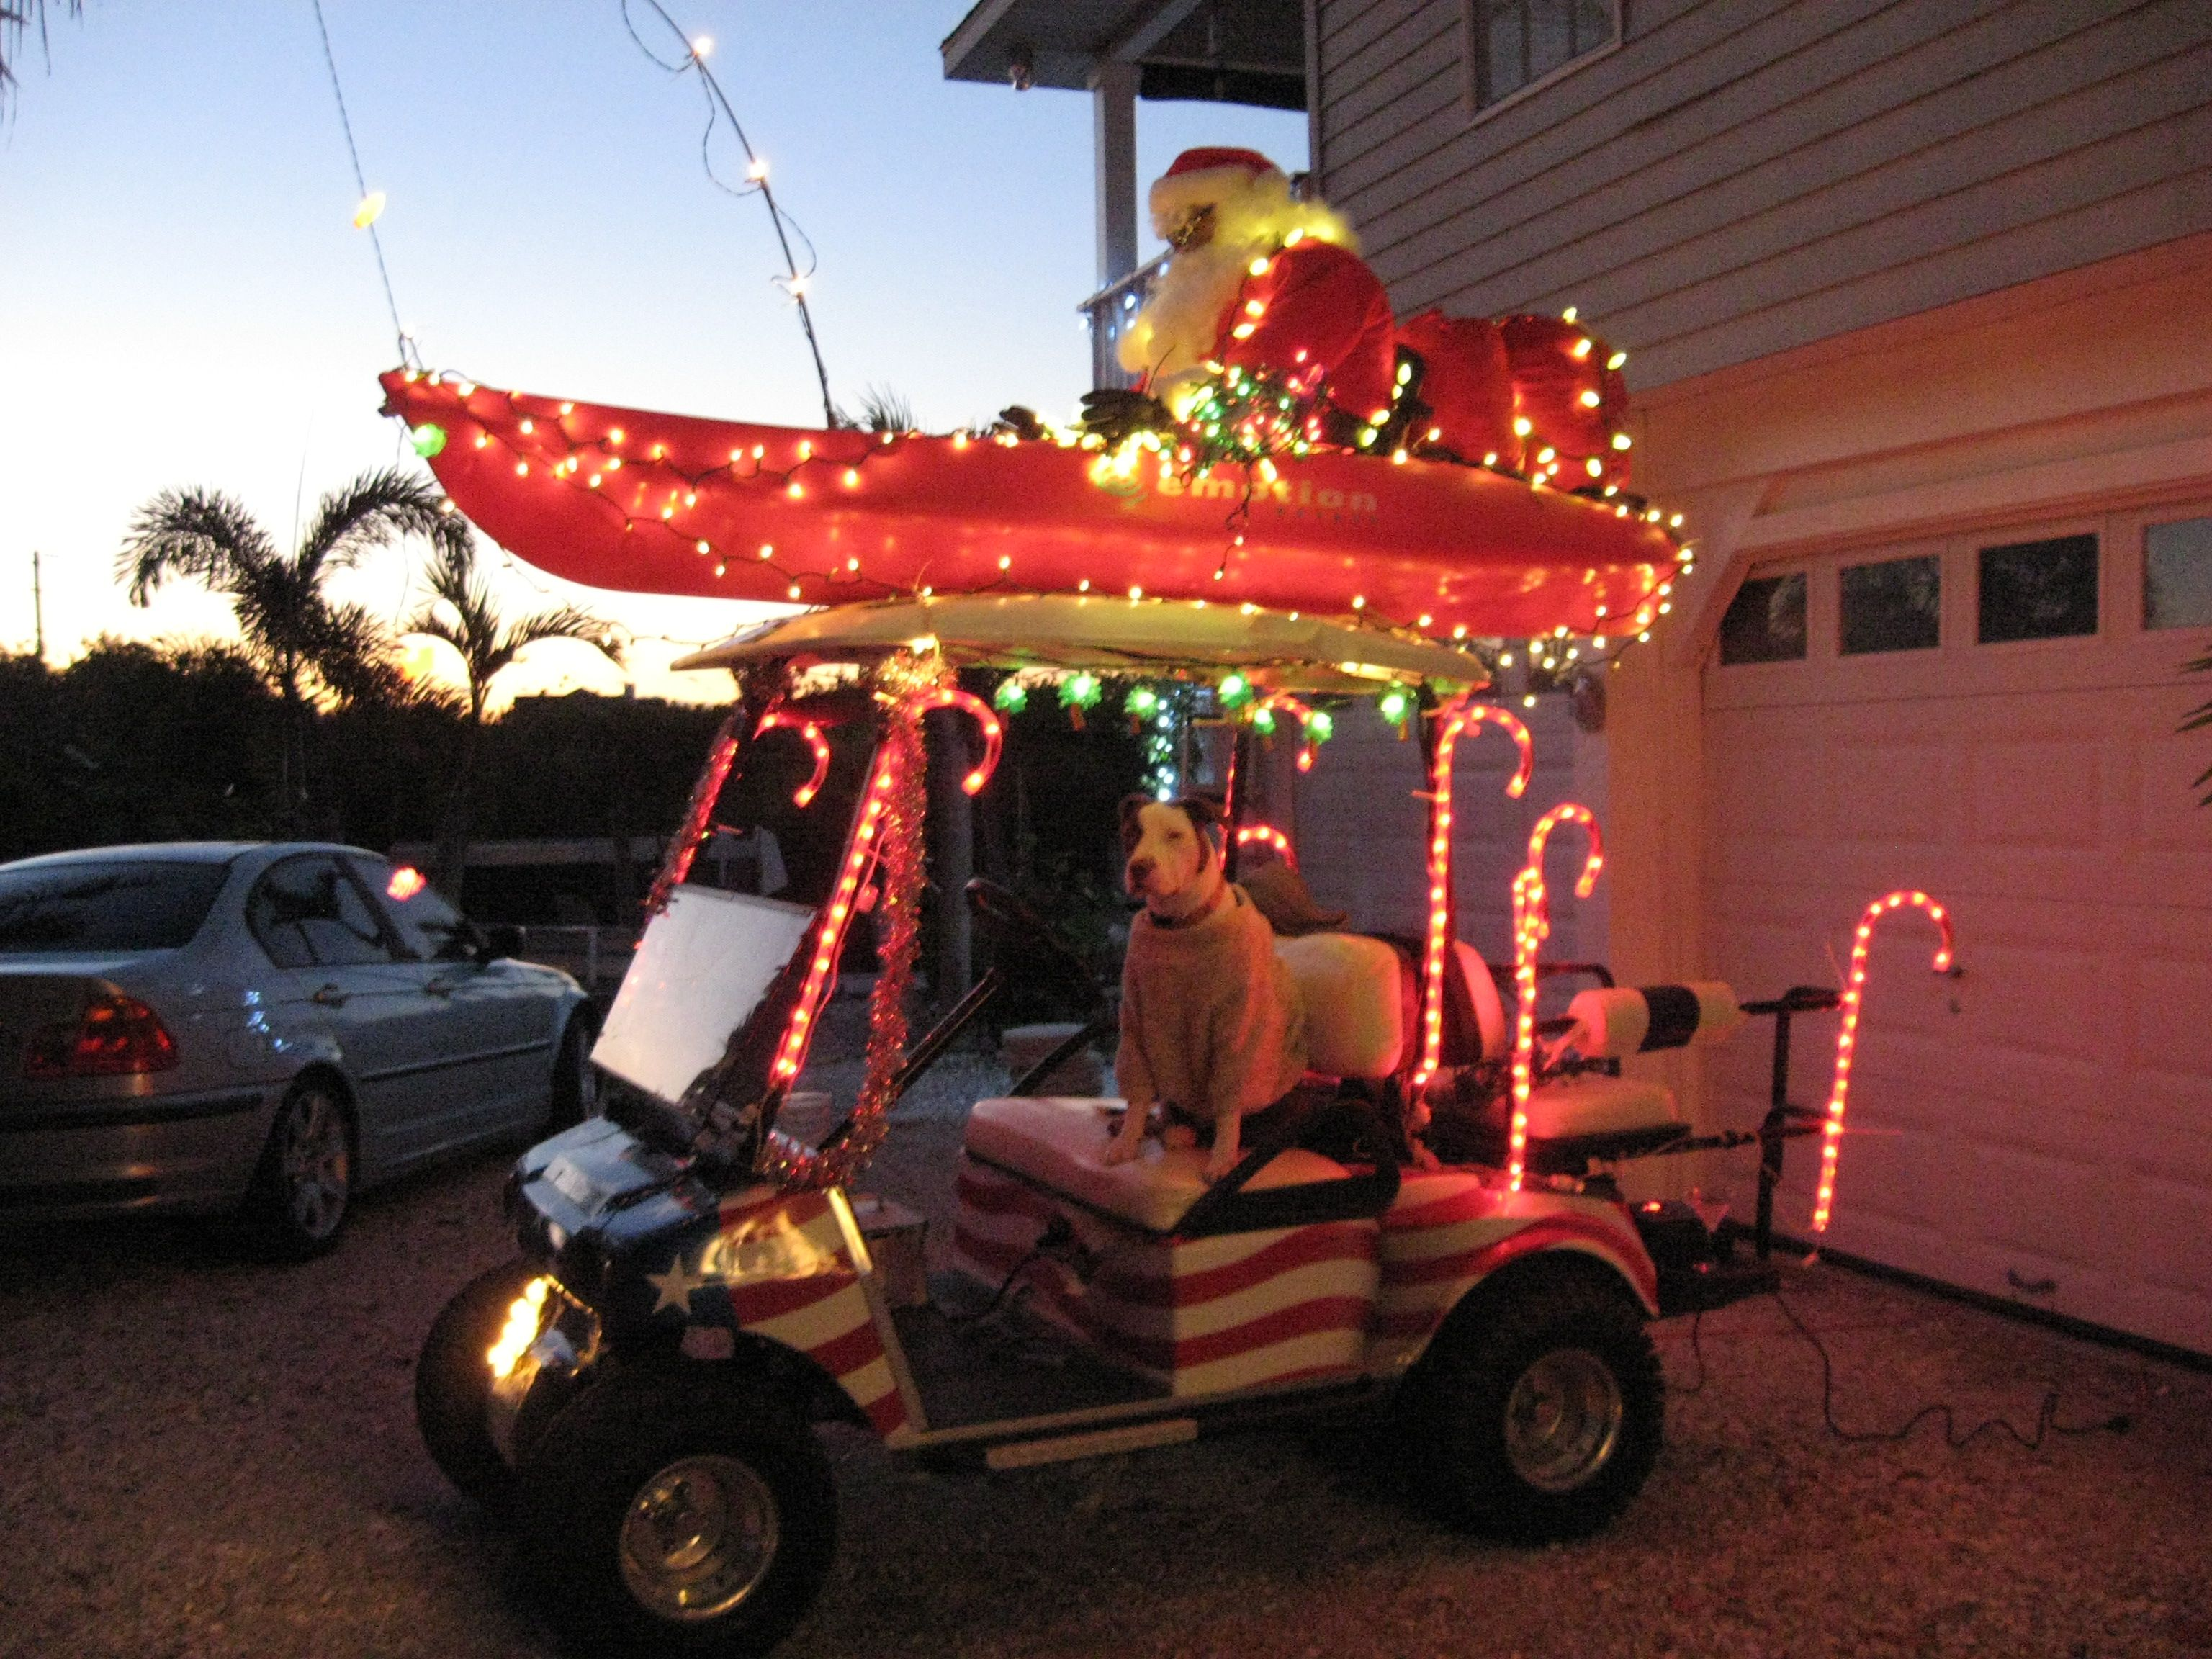 Golf Cart Christmas Decorations.Golf Cart Parade On Terra Ceia Island Xmas Island Style